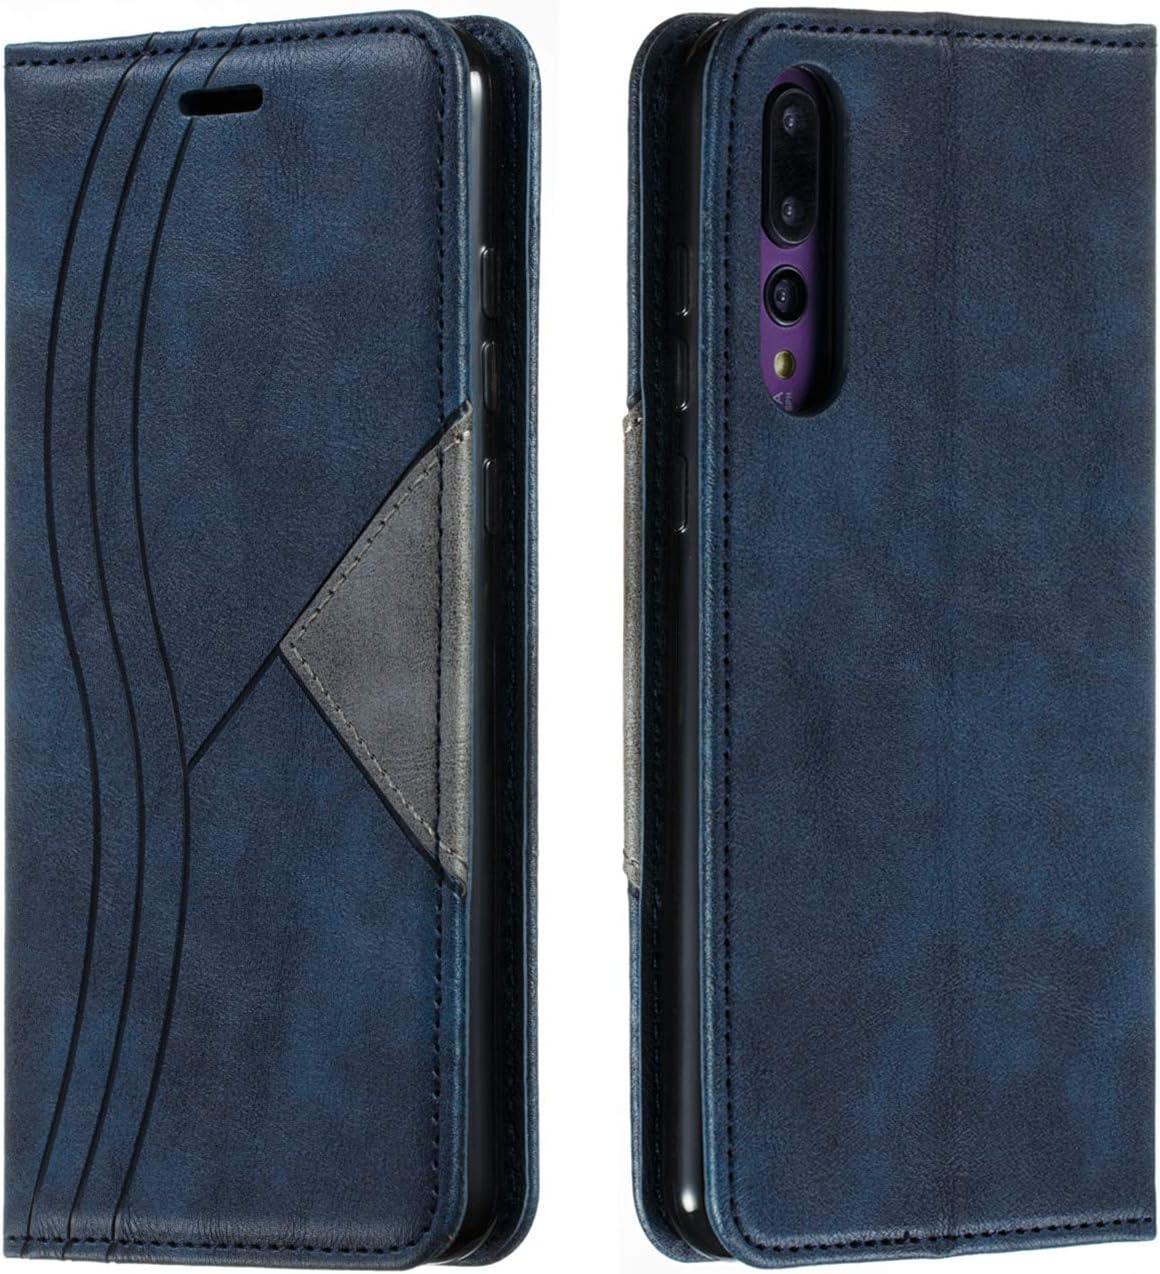 HUDDU H/ülle Kompatibel mit Huawei P20 Pro Handyh/ülle Leder Flip Premium PU Schutzh/ülle Kartenfach Flip Tasche Soft St/änder Brieftasche Lederh/ülle Klapph/ülle Bumper Cover Sto/ßfest Blau